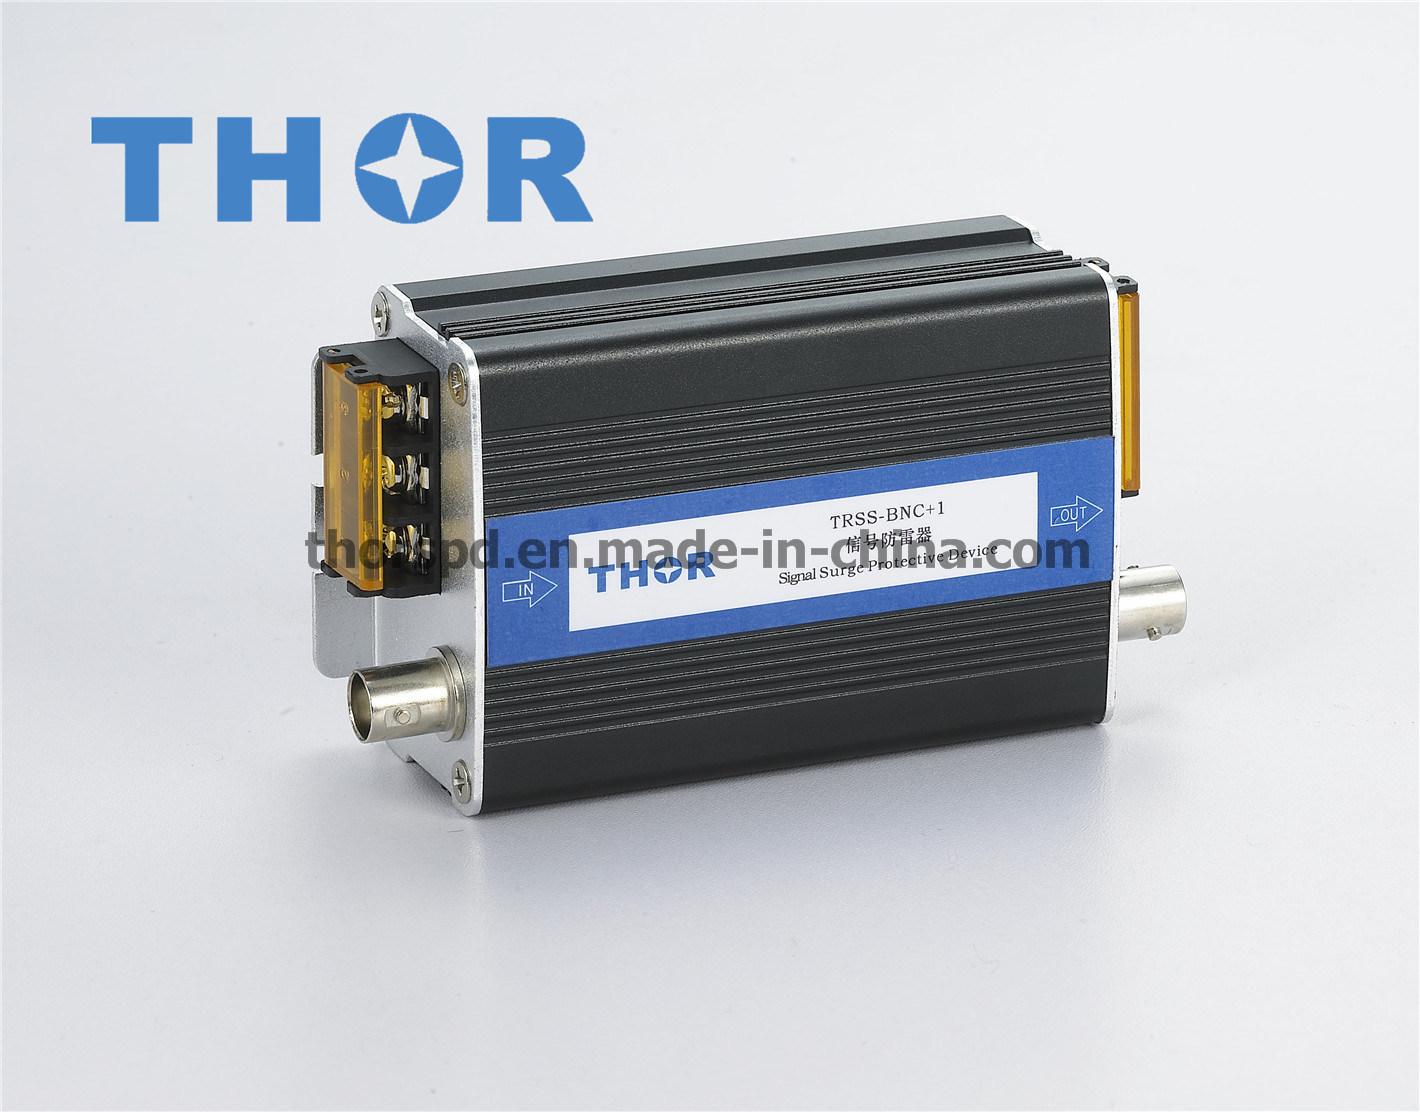 2 in 1 Multi-Function Signal Lightning Surge Arrestor